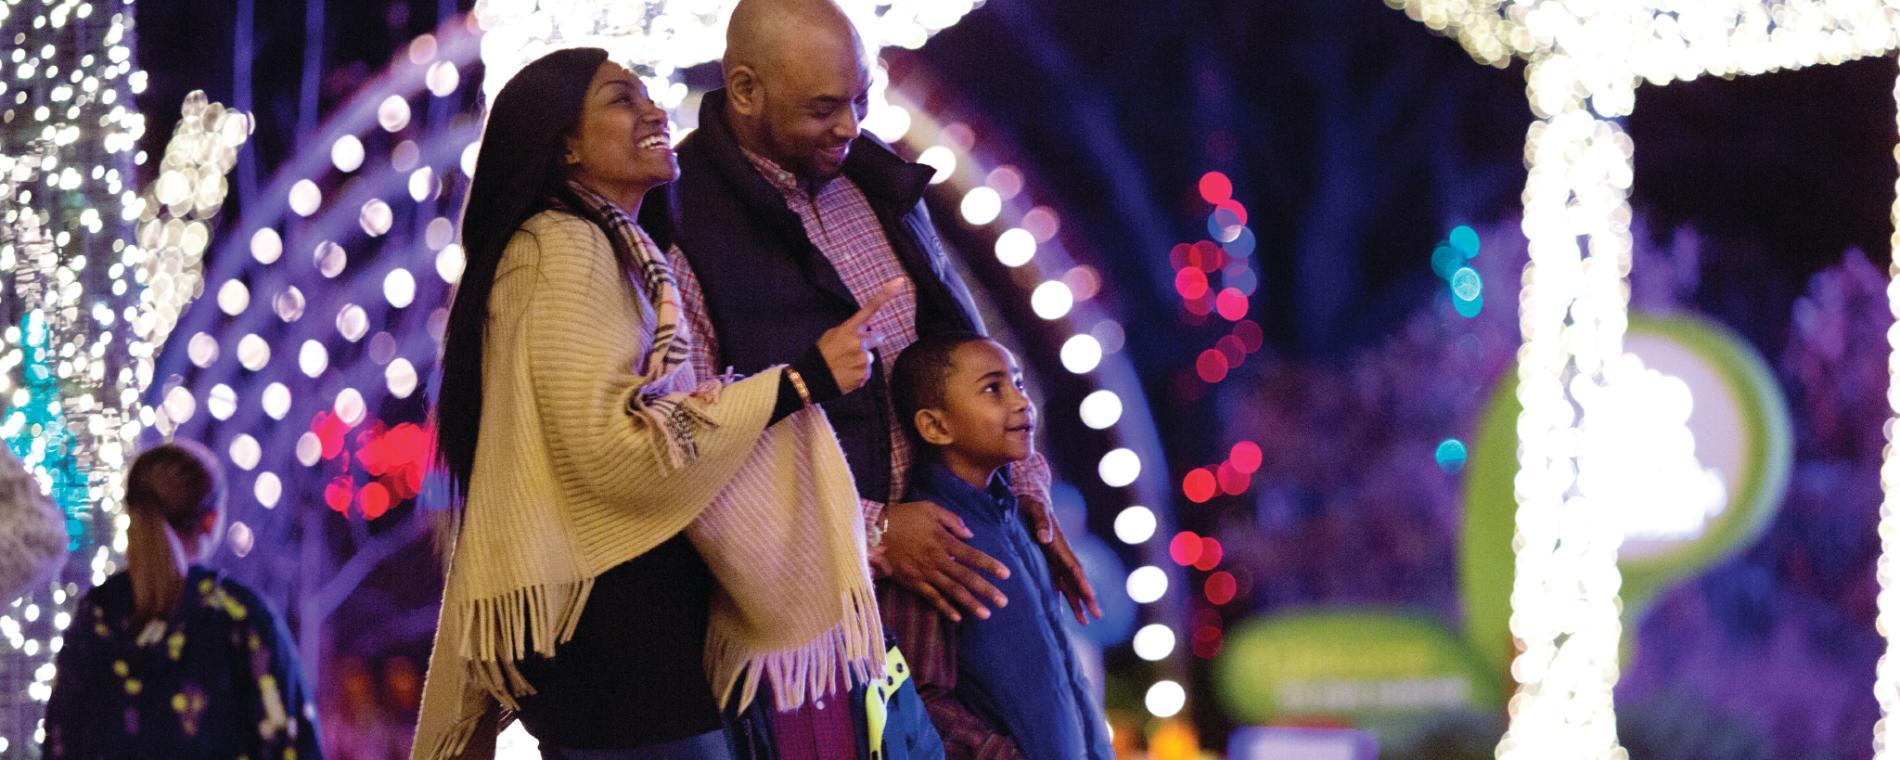 Wichita Christmas Light Displays 2020 Illuminations 2020 at Botanica Wichita | Holiday Light Display